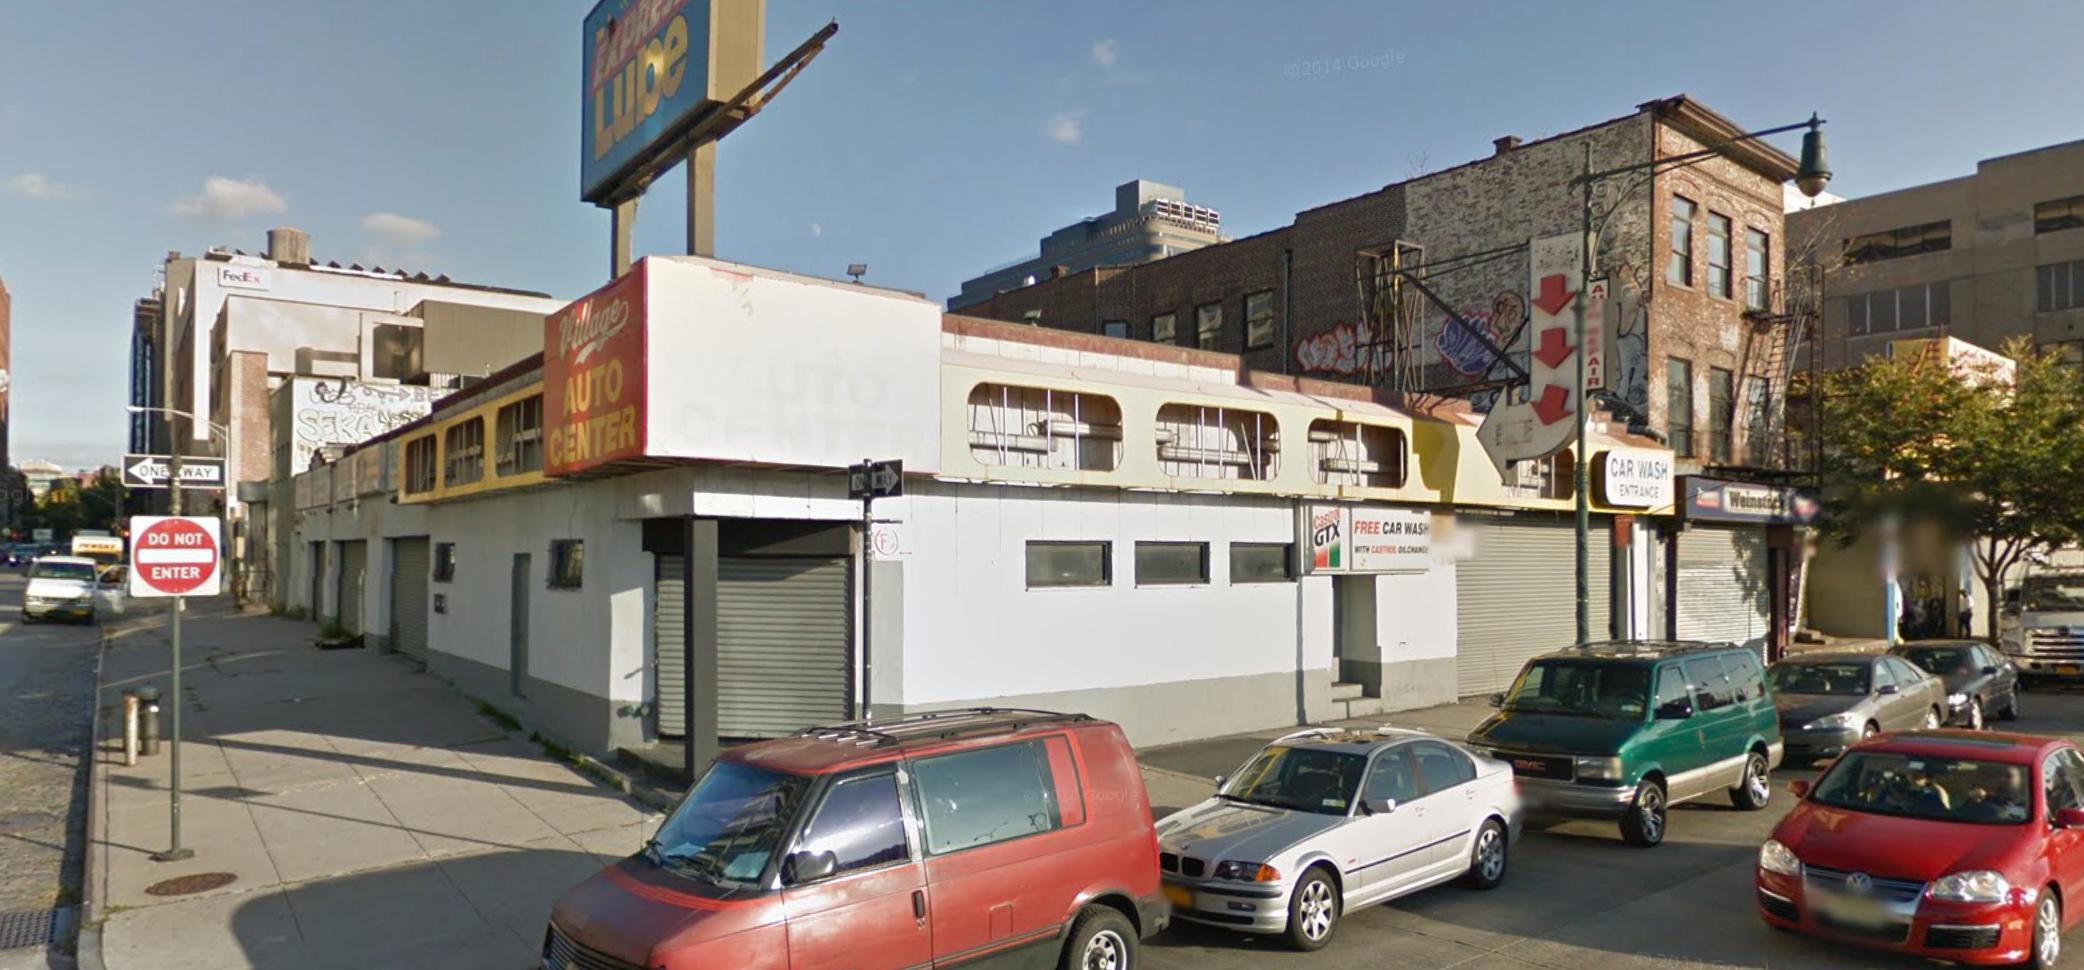 160 Leroy Street